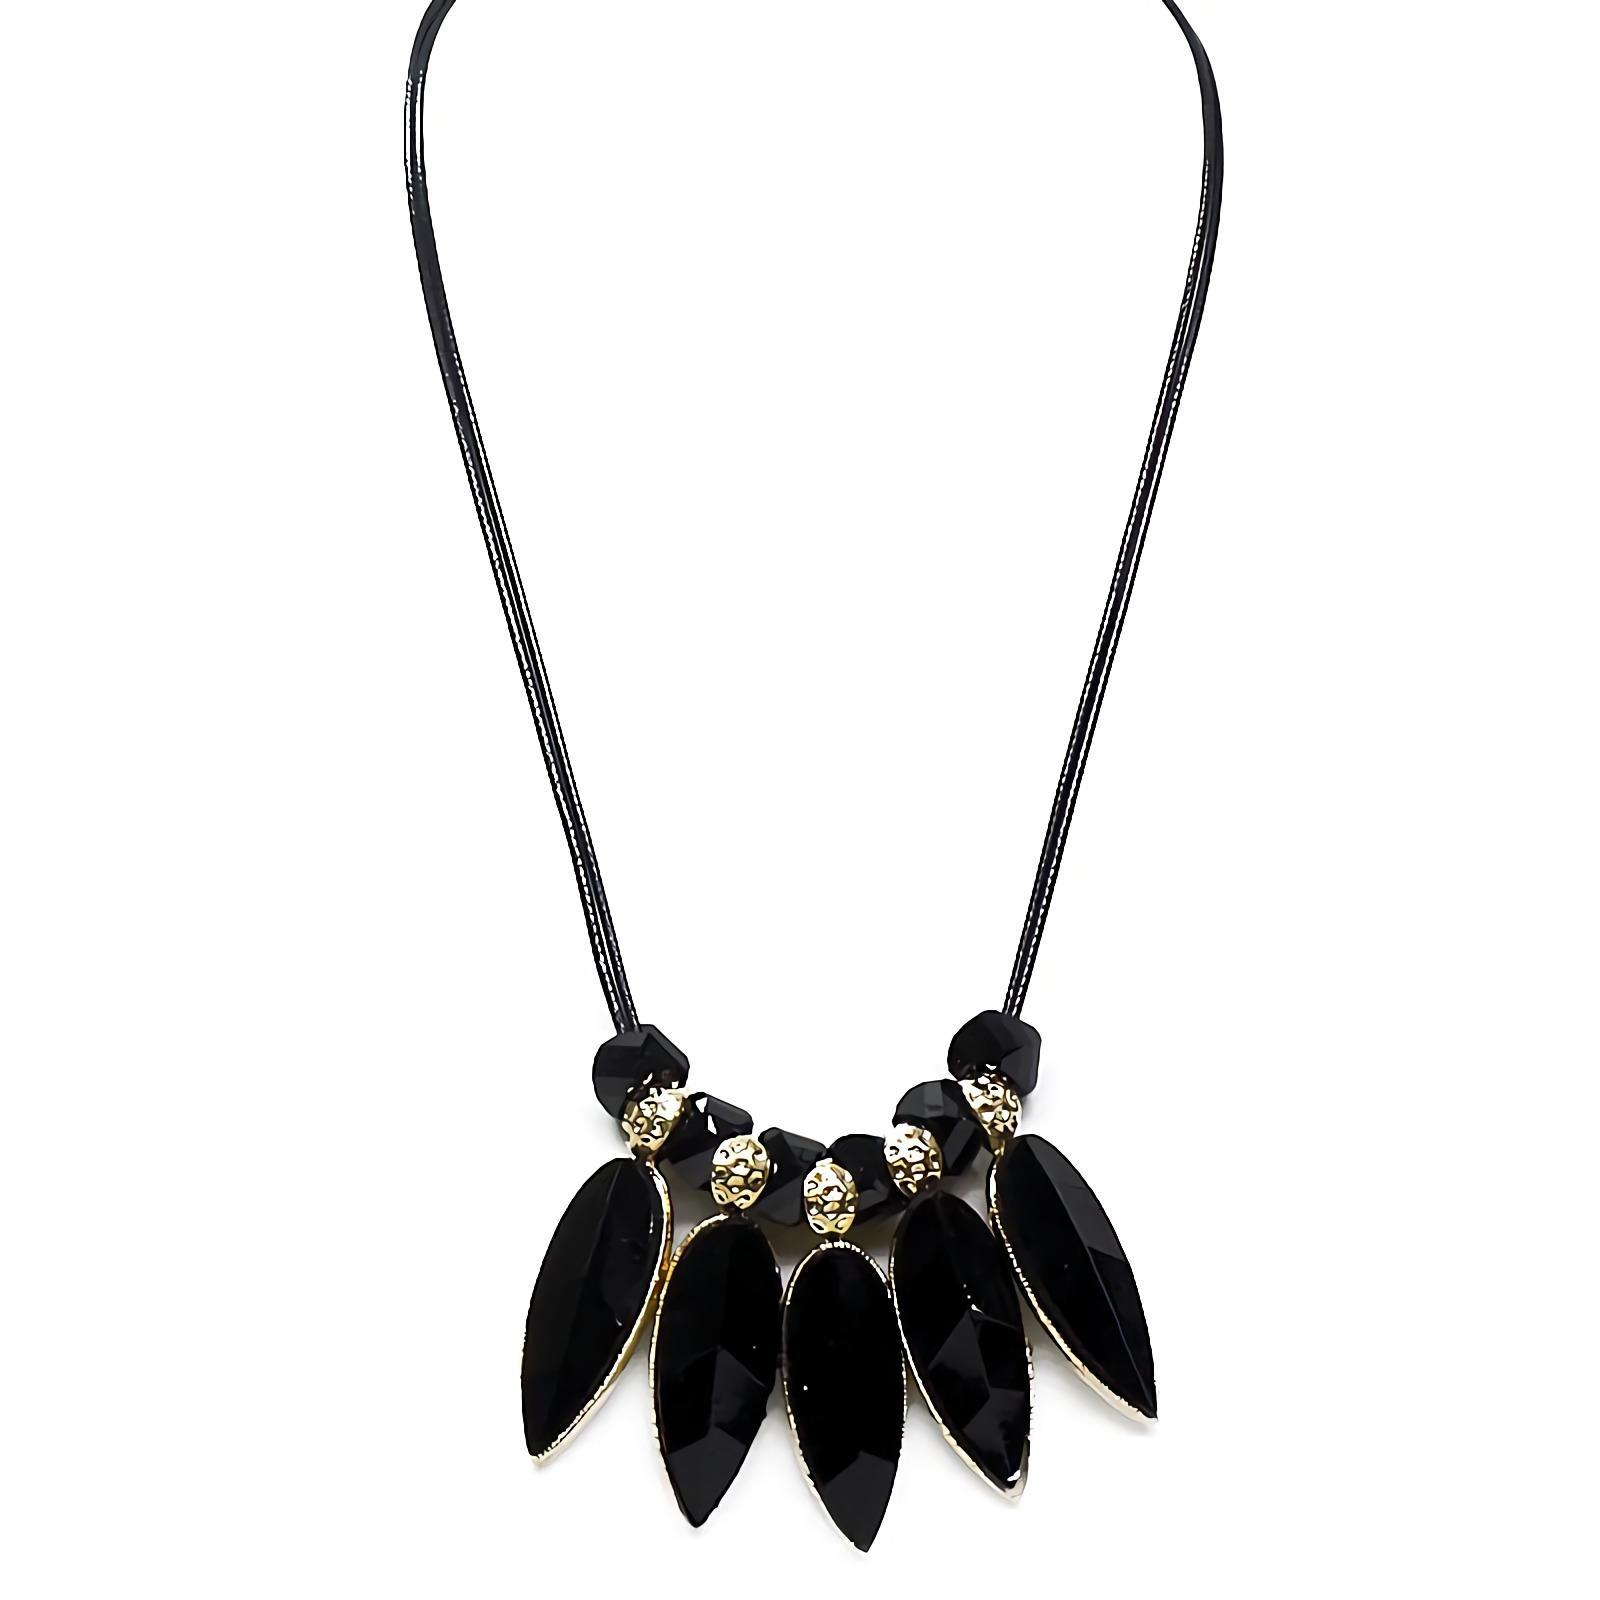 OFASHION Aksesoris Kalung CA-180314-K010 Necklace Fashion Xuping Jewelry Hitam Hitam